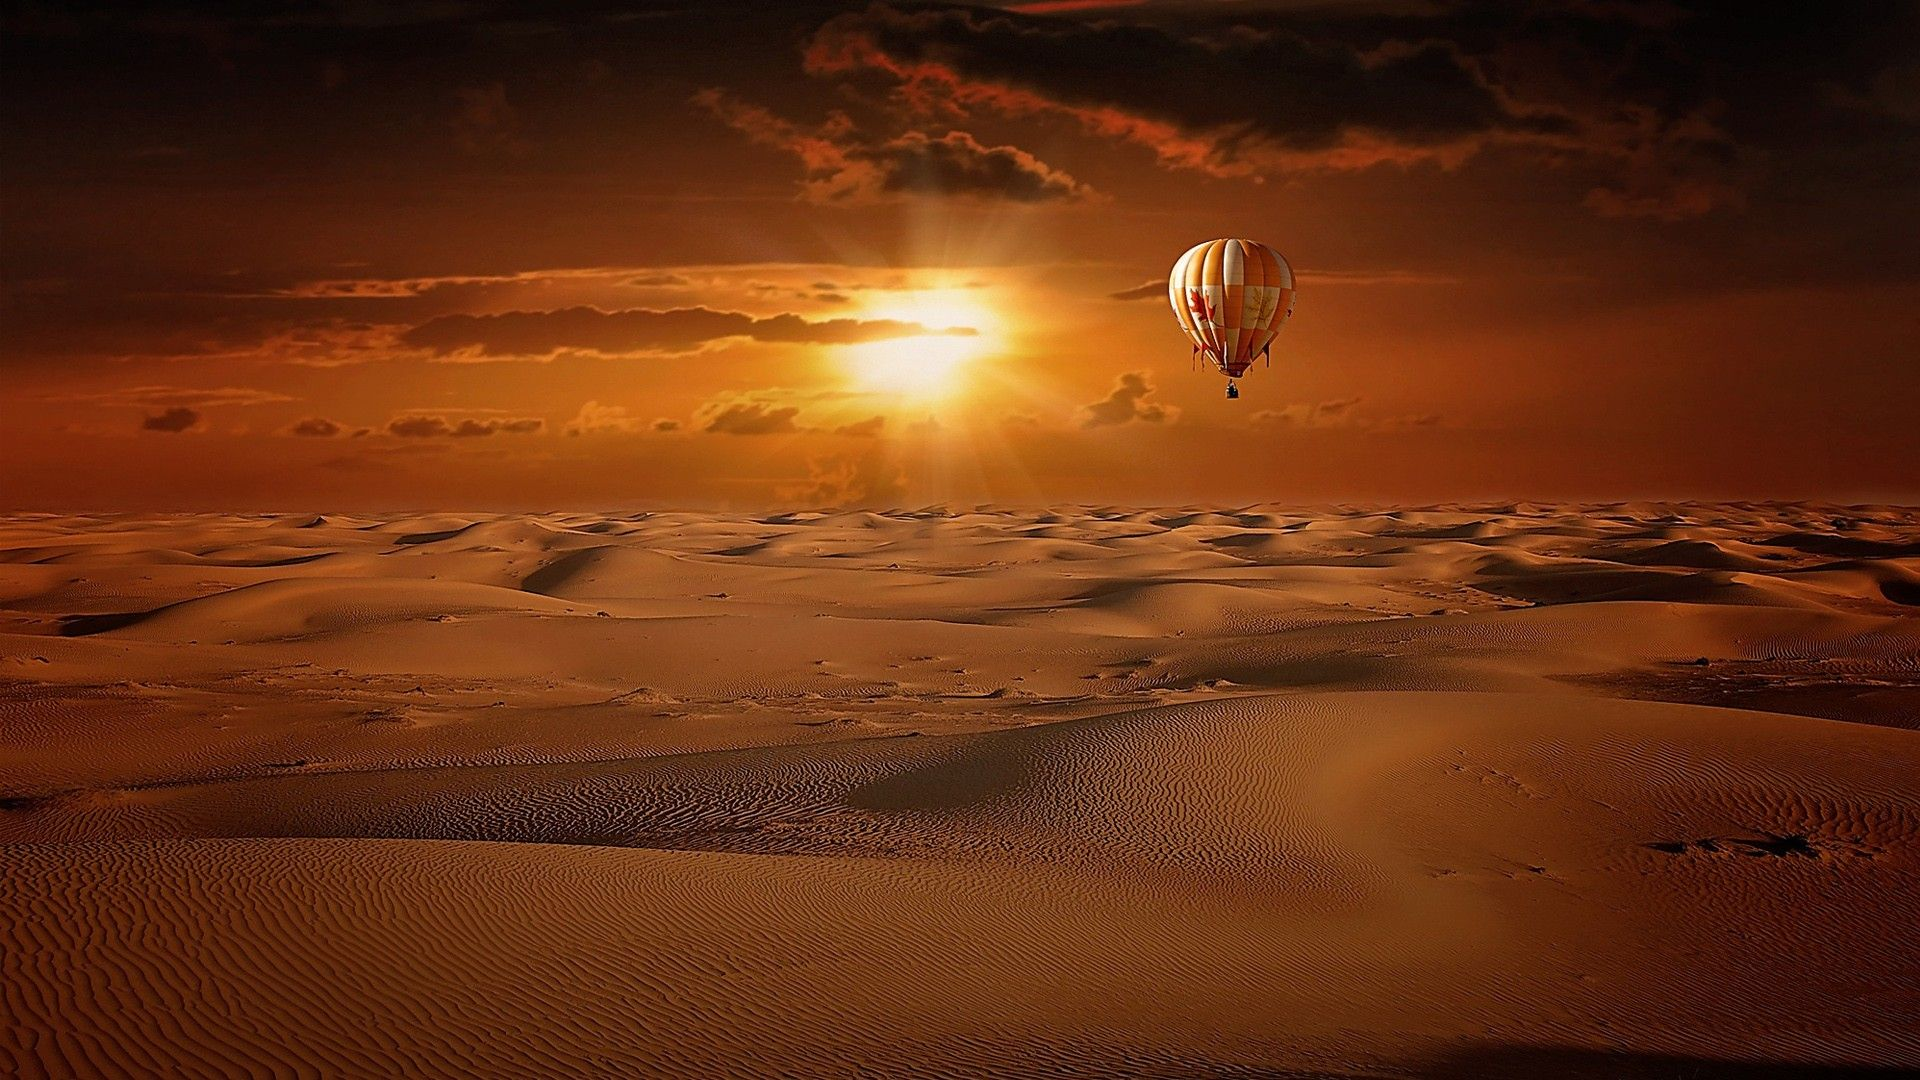 Great Wallpaper Night Hot Air Balloon - 42d8afed238b5cfaeae55247a63b8513  Snapshot-784558.jpg